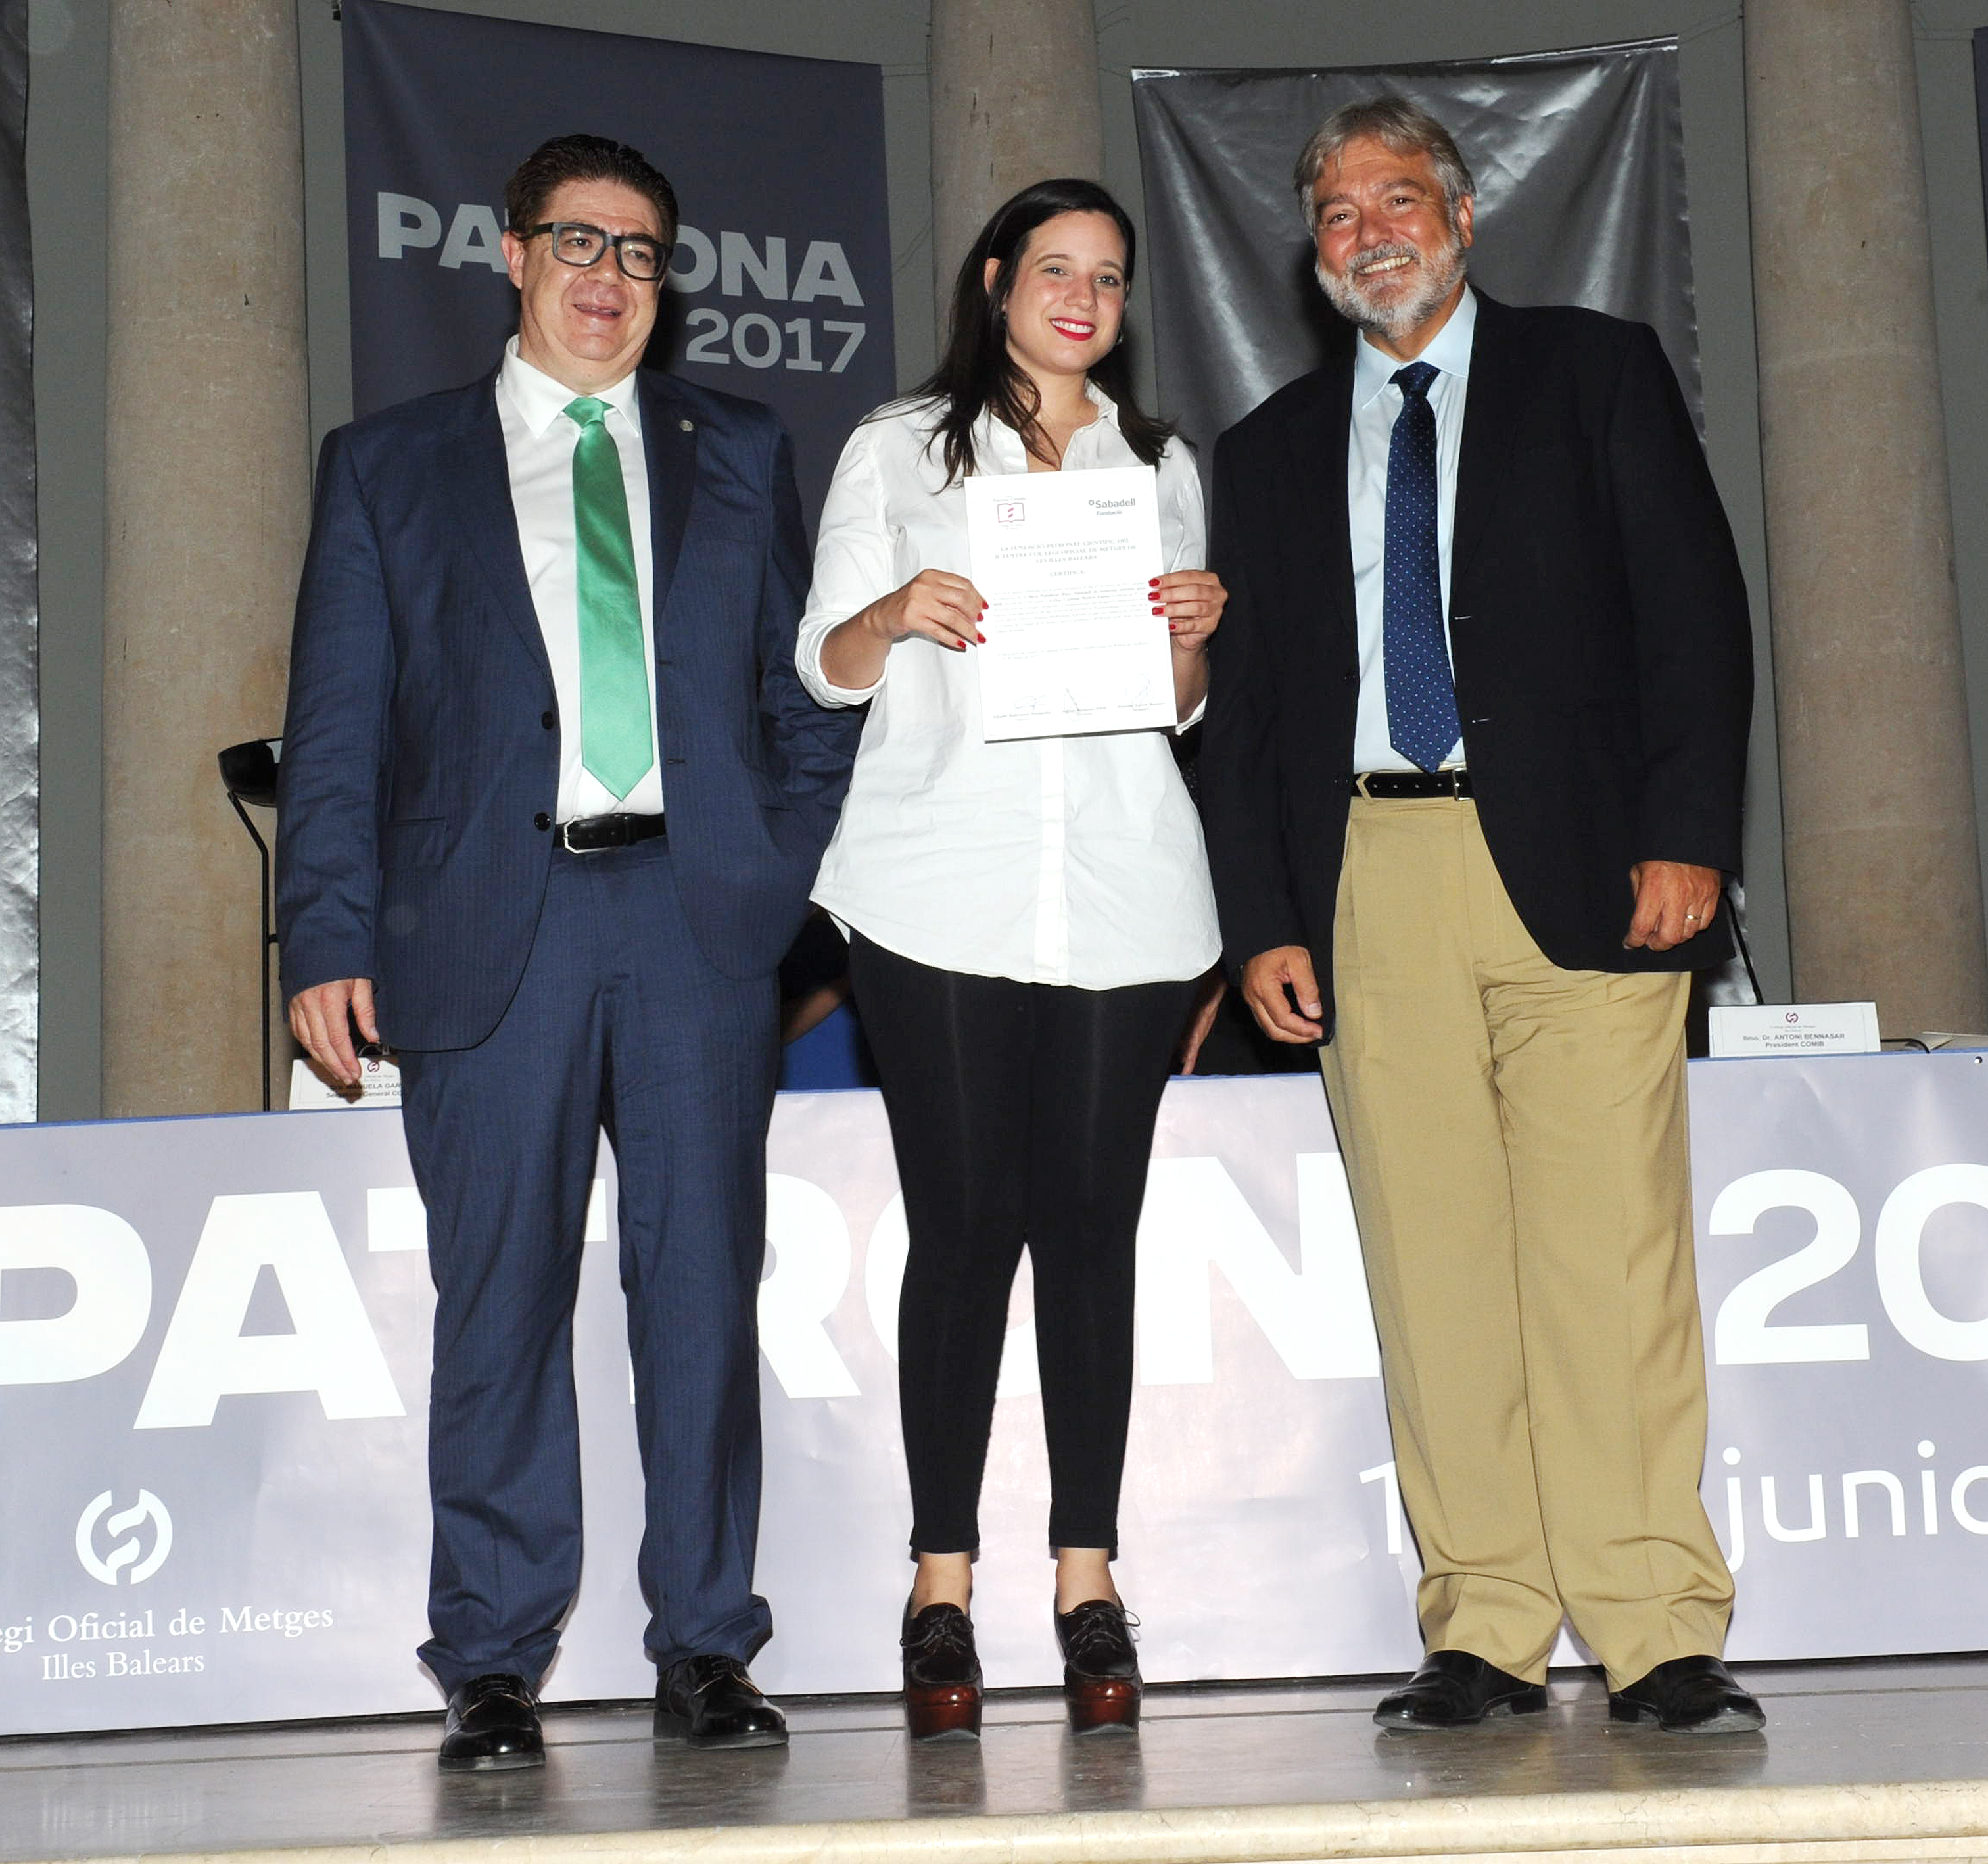 Paola Sambo recogió la-beca de la Dra. Carmen-Muñoz López